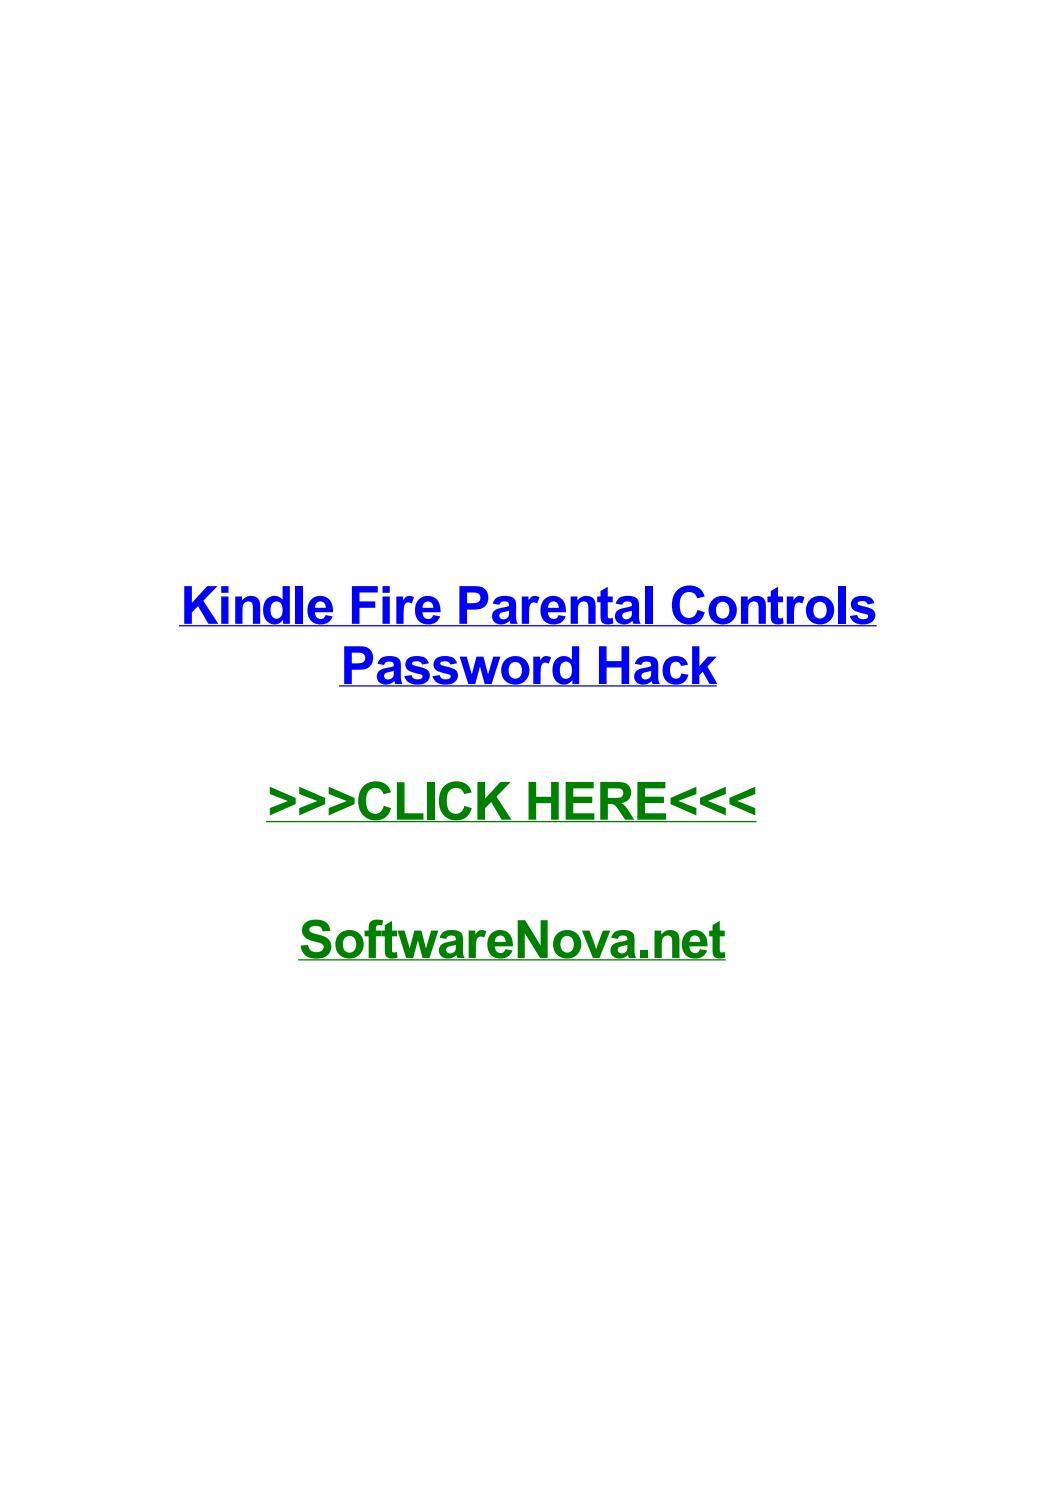 Kindle fire parental controls password hack by kamekiarugd